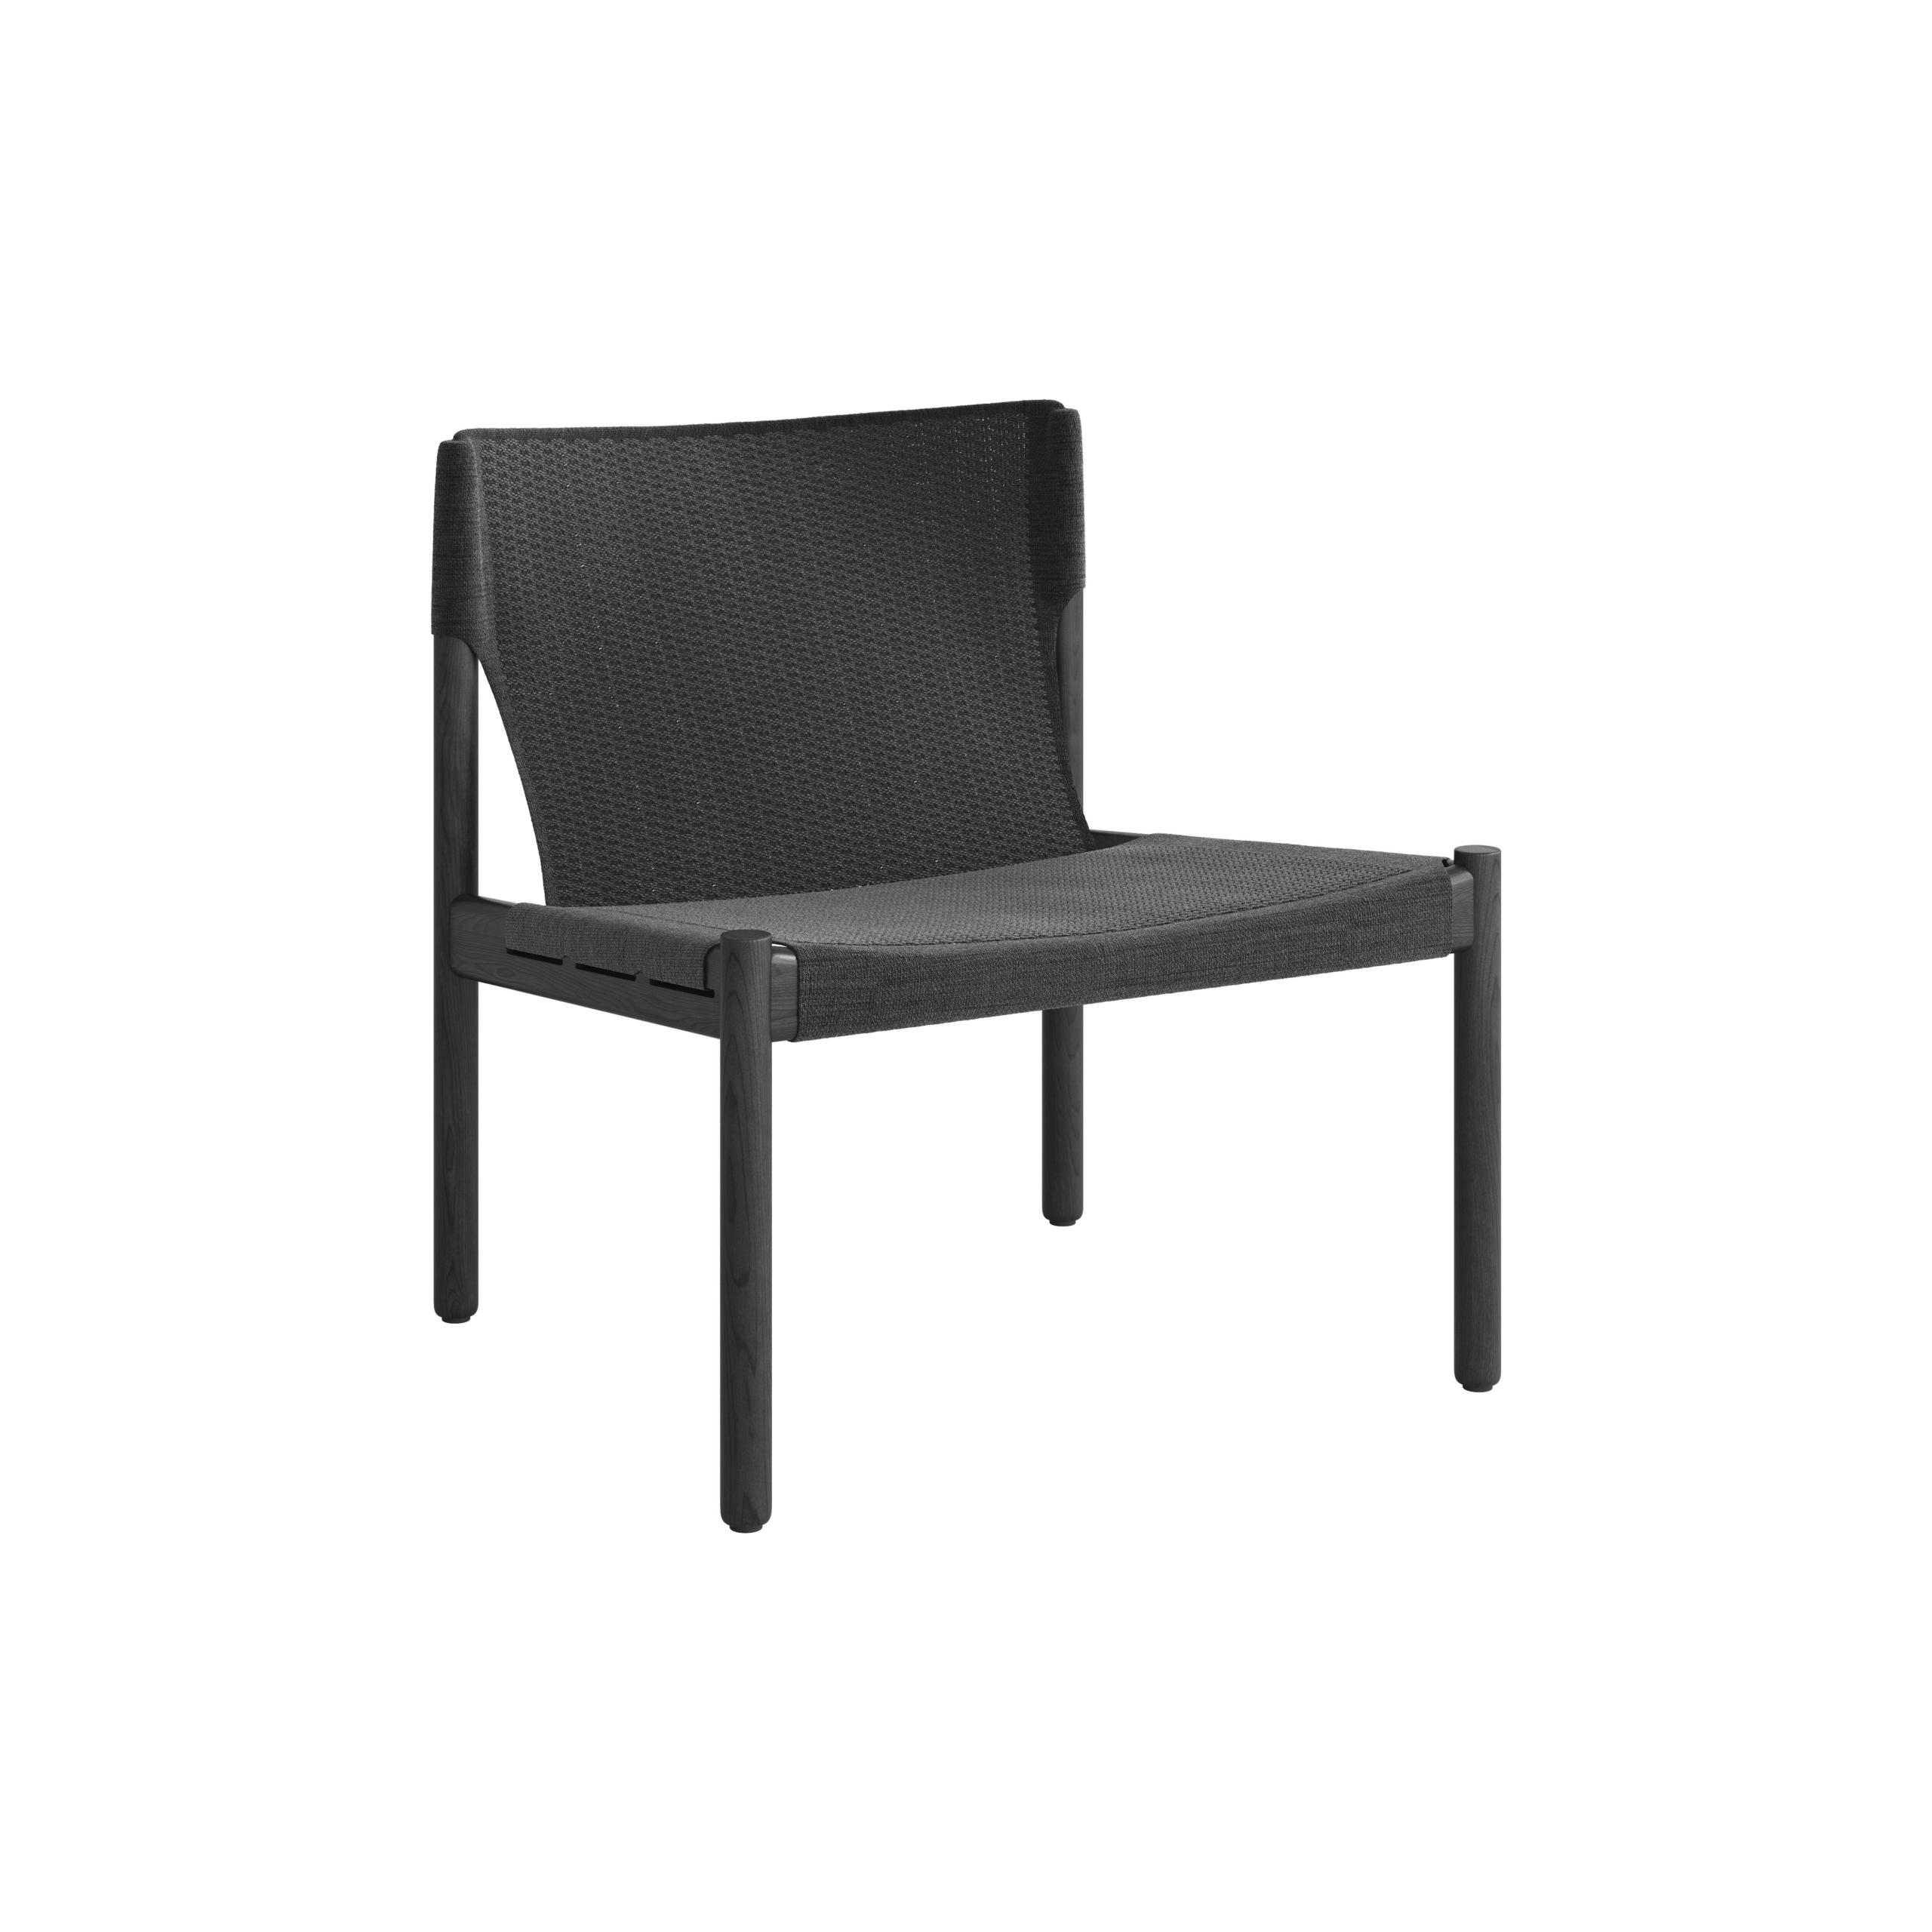 Evo Lounge chair product image 6